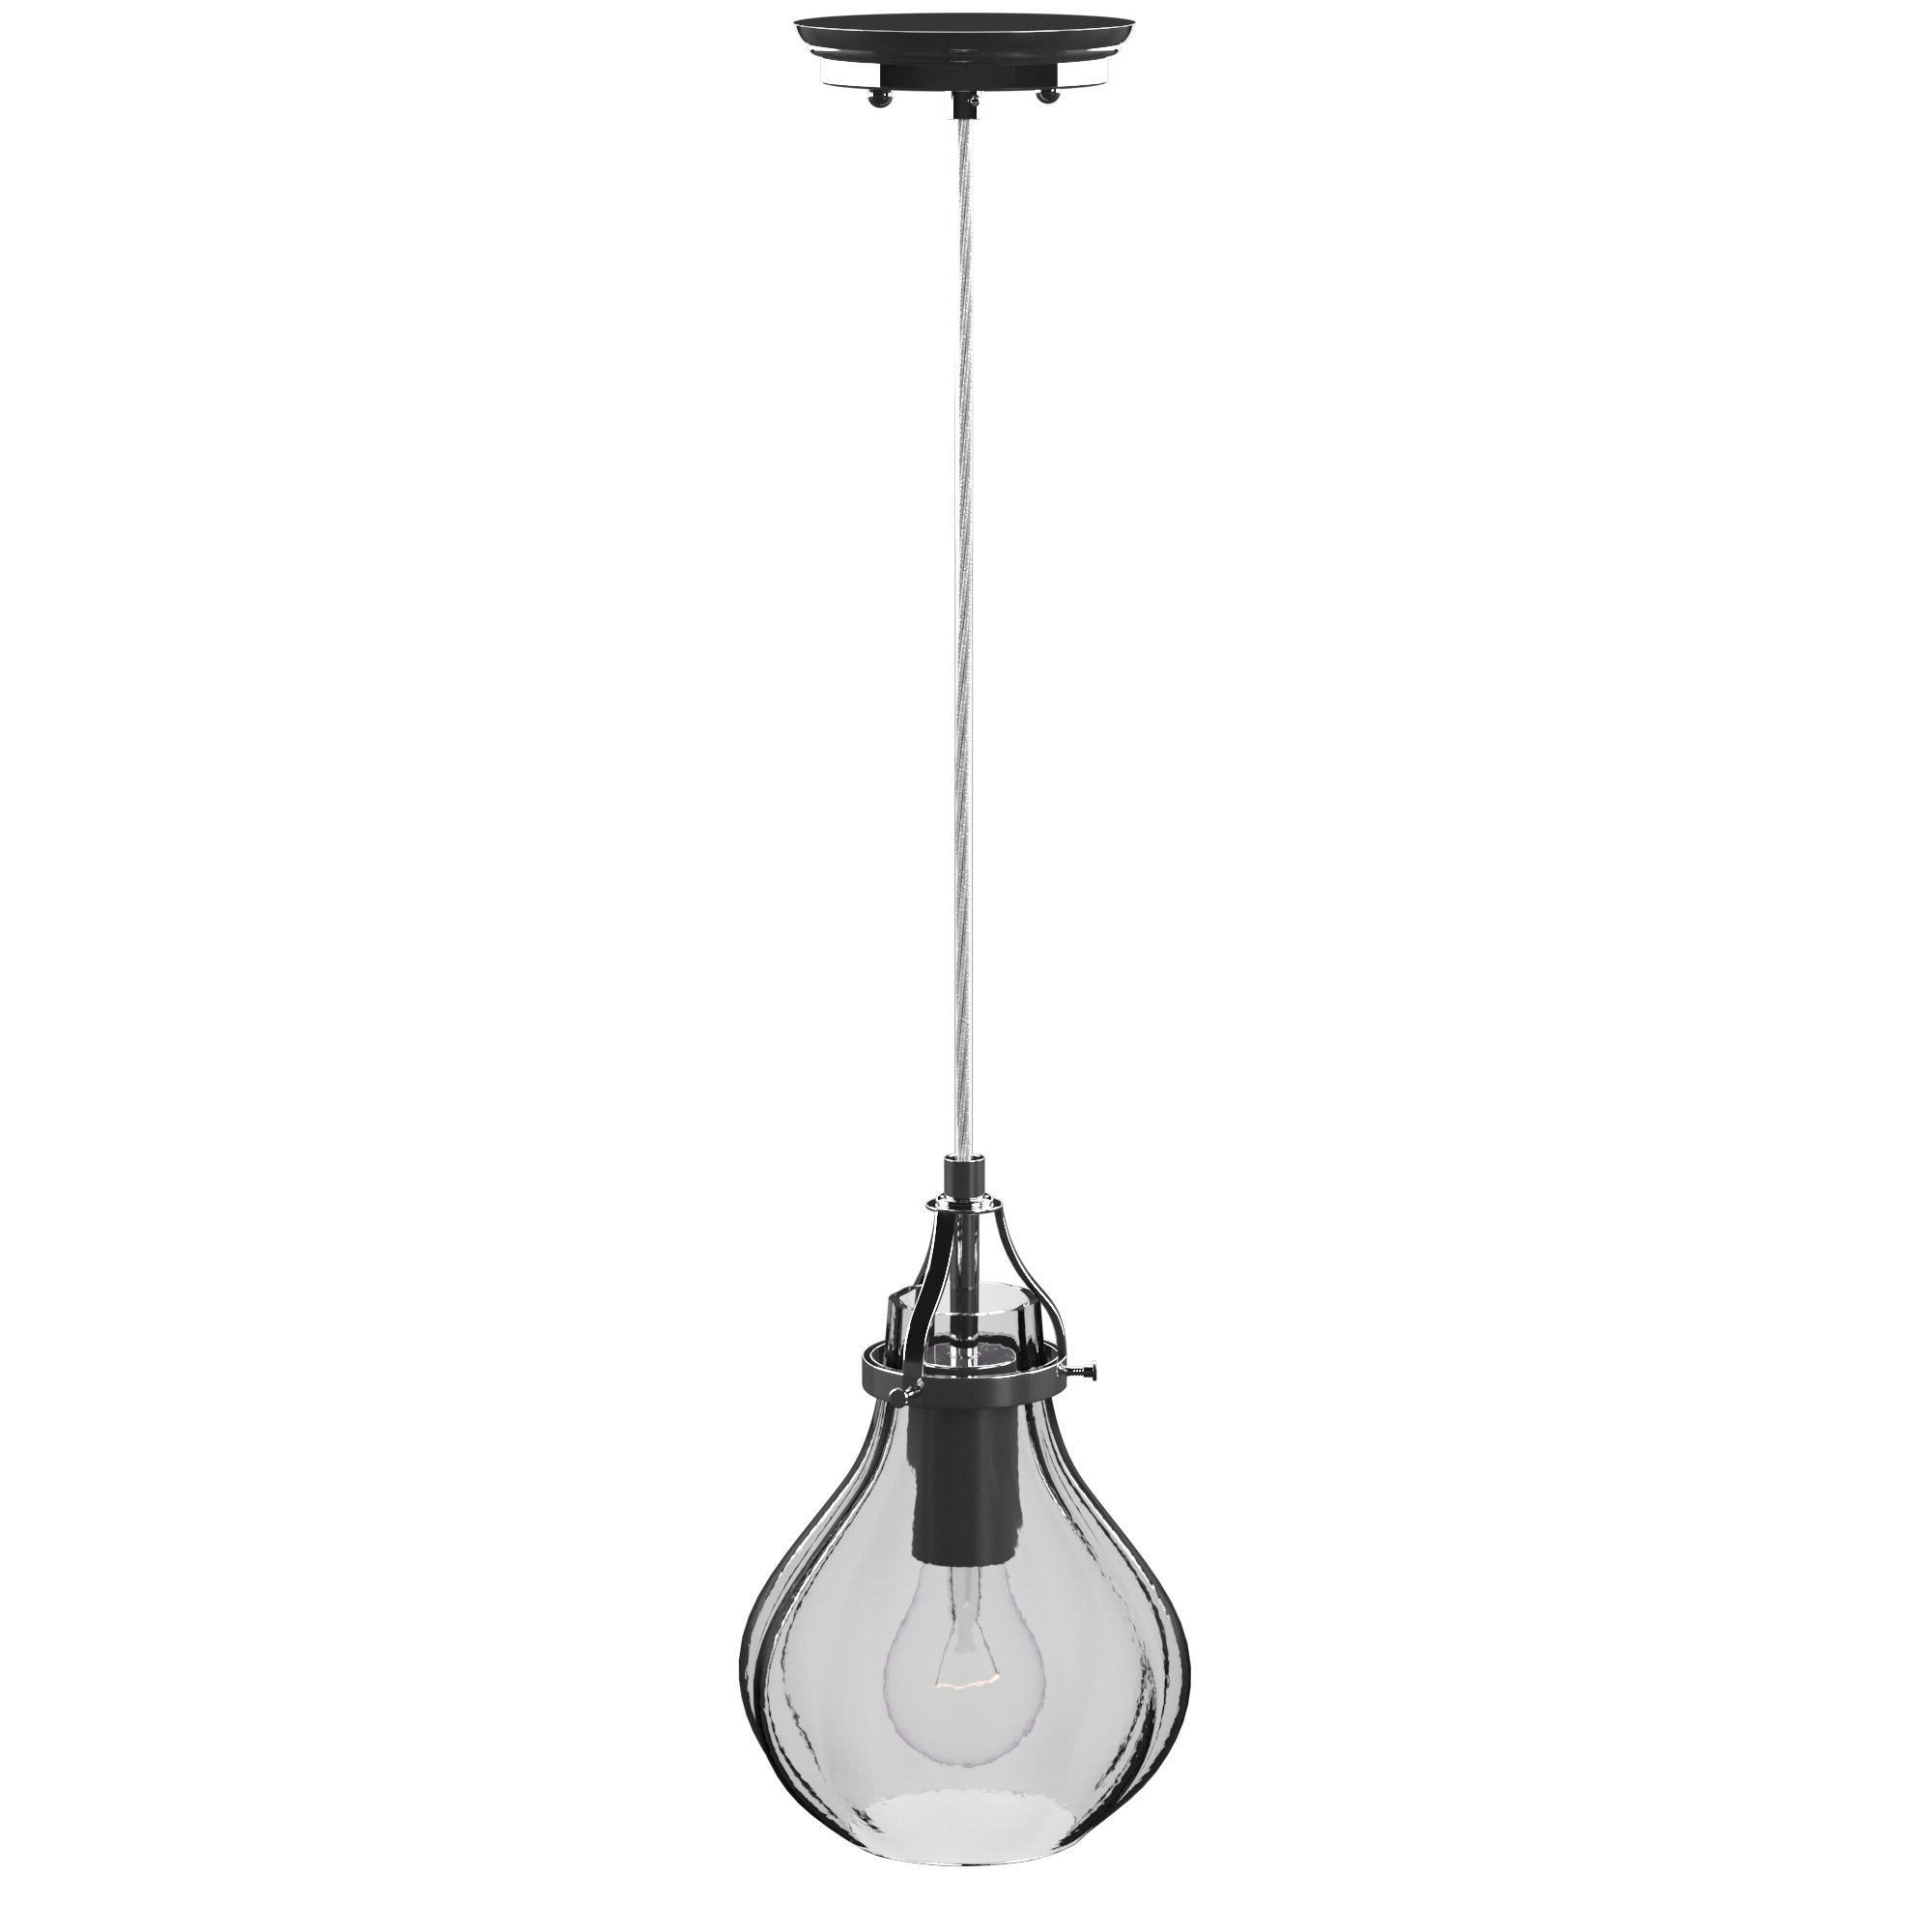 Newest Giacinta 1-Light Single Bell Pendants with Orofino 1-Light Single Teardrop Pendant